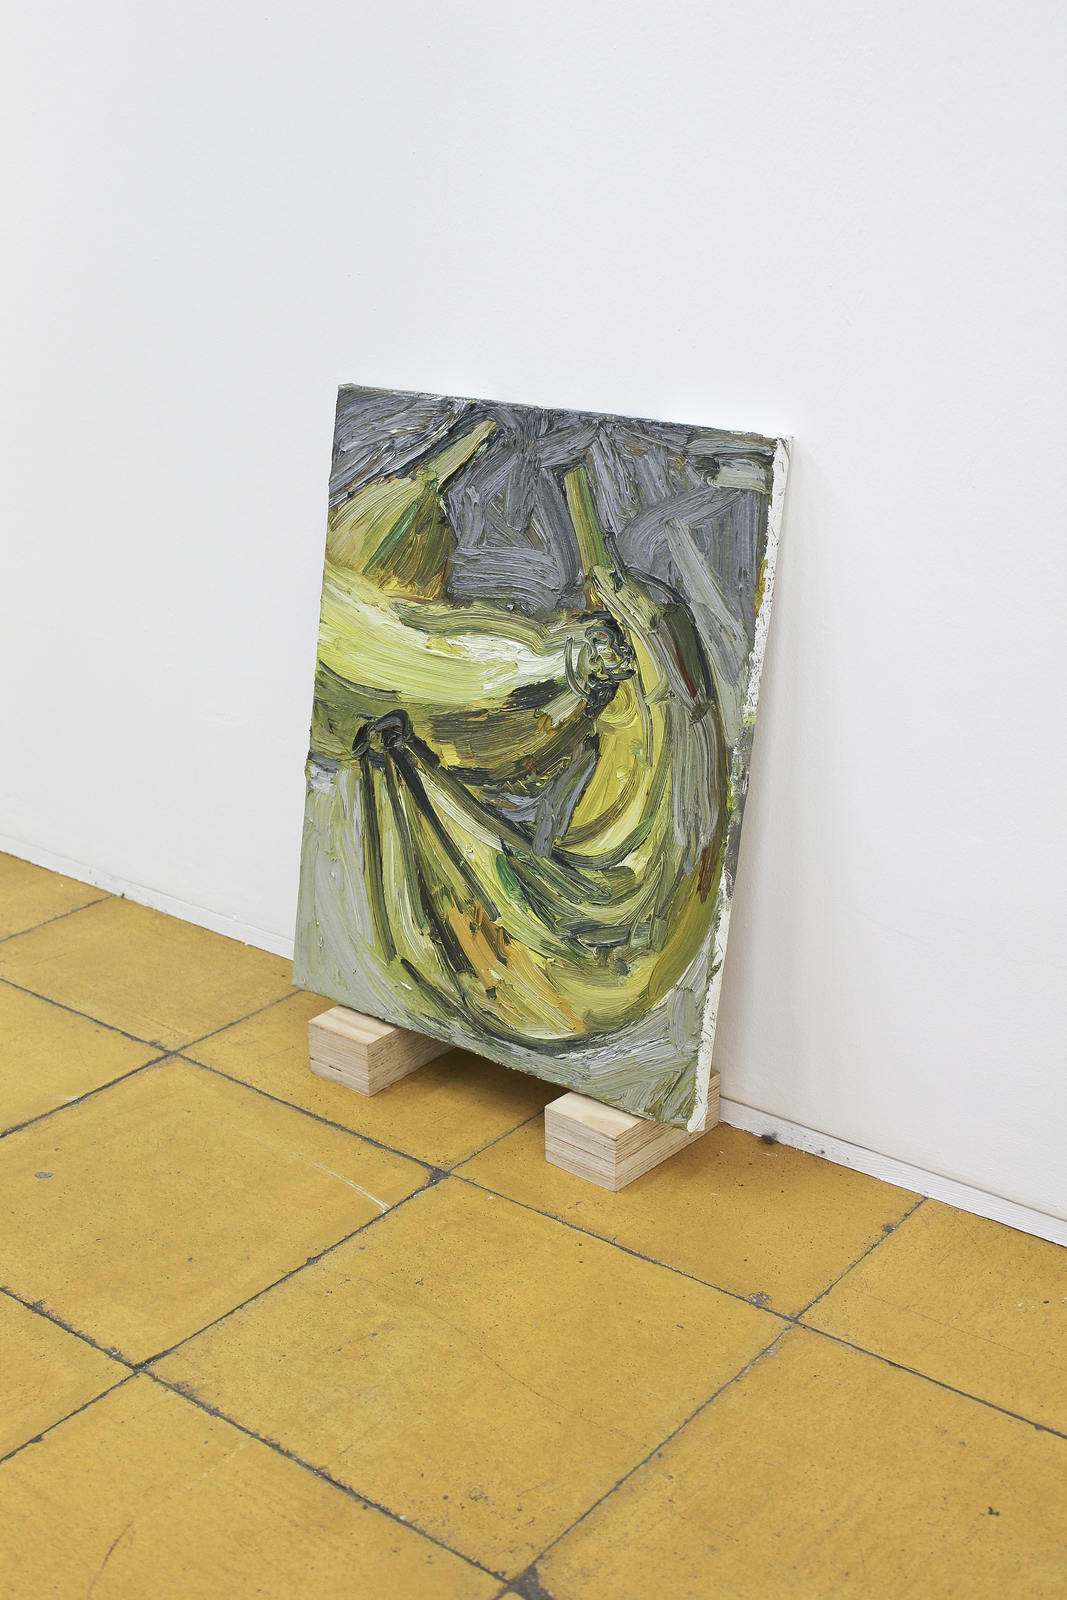 Wieske Wester at Dürst Britt & Mayhew 03